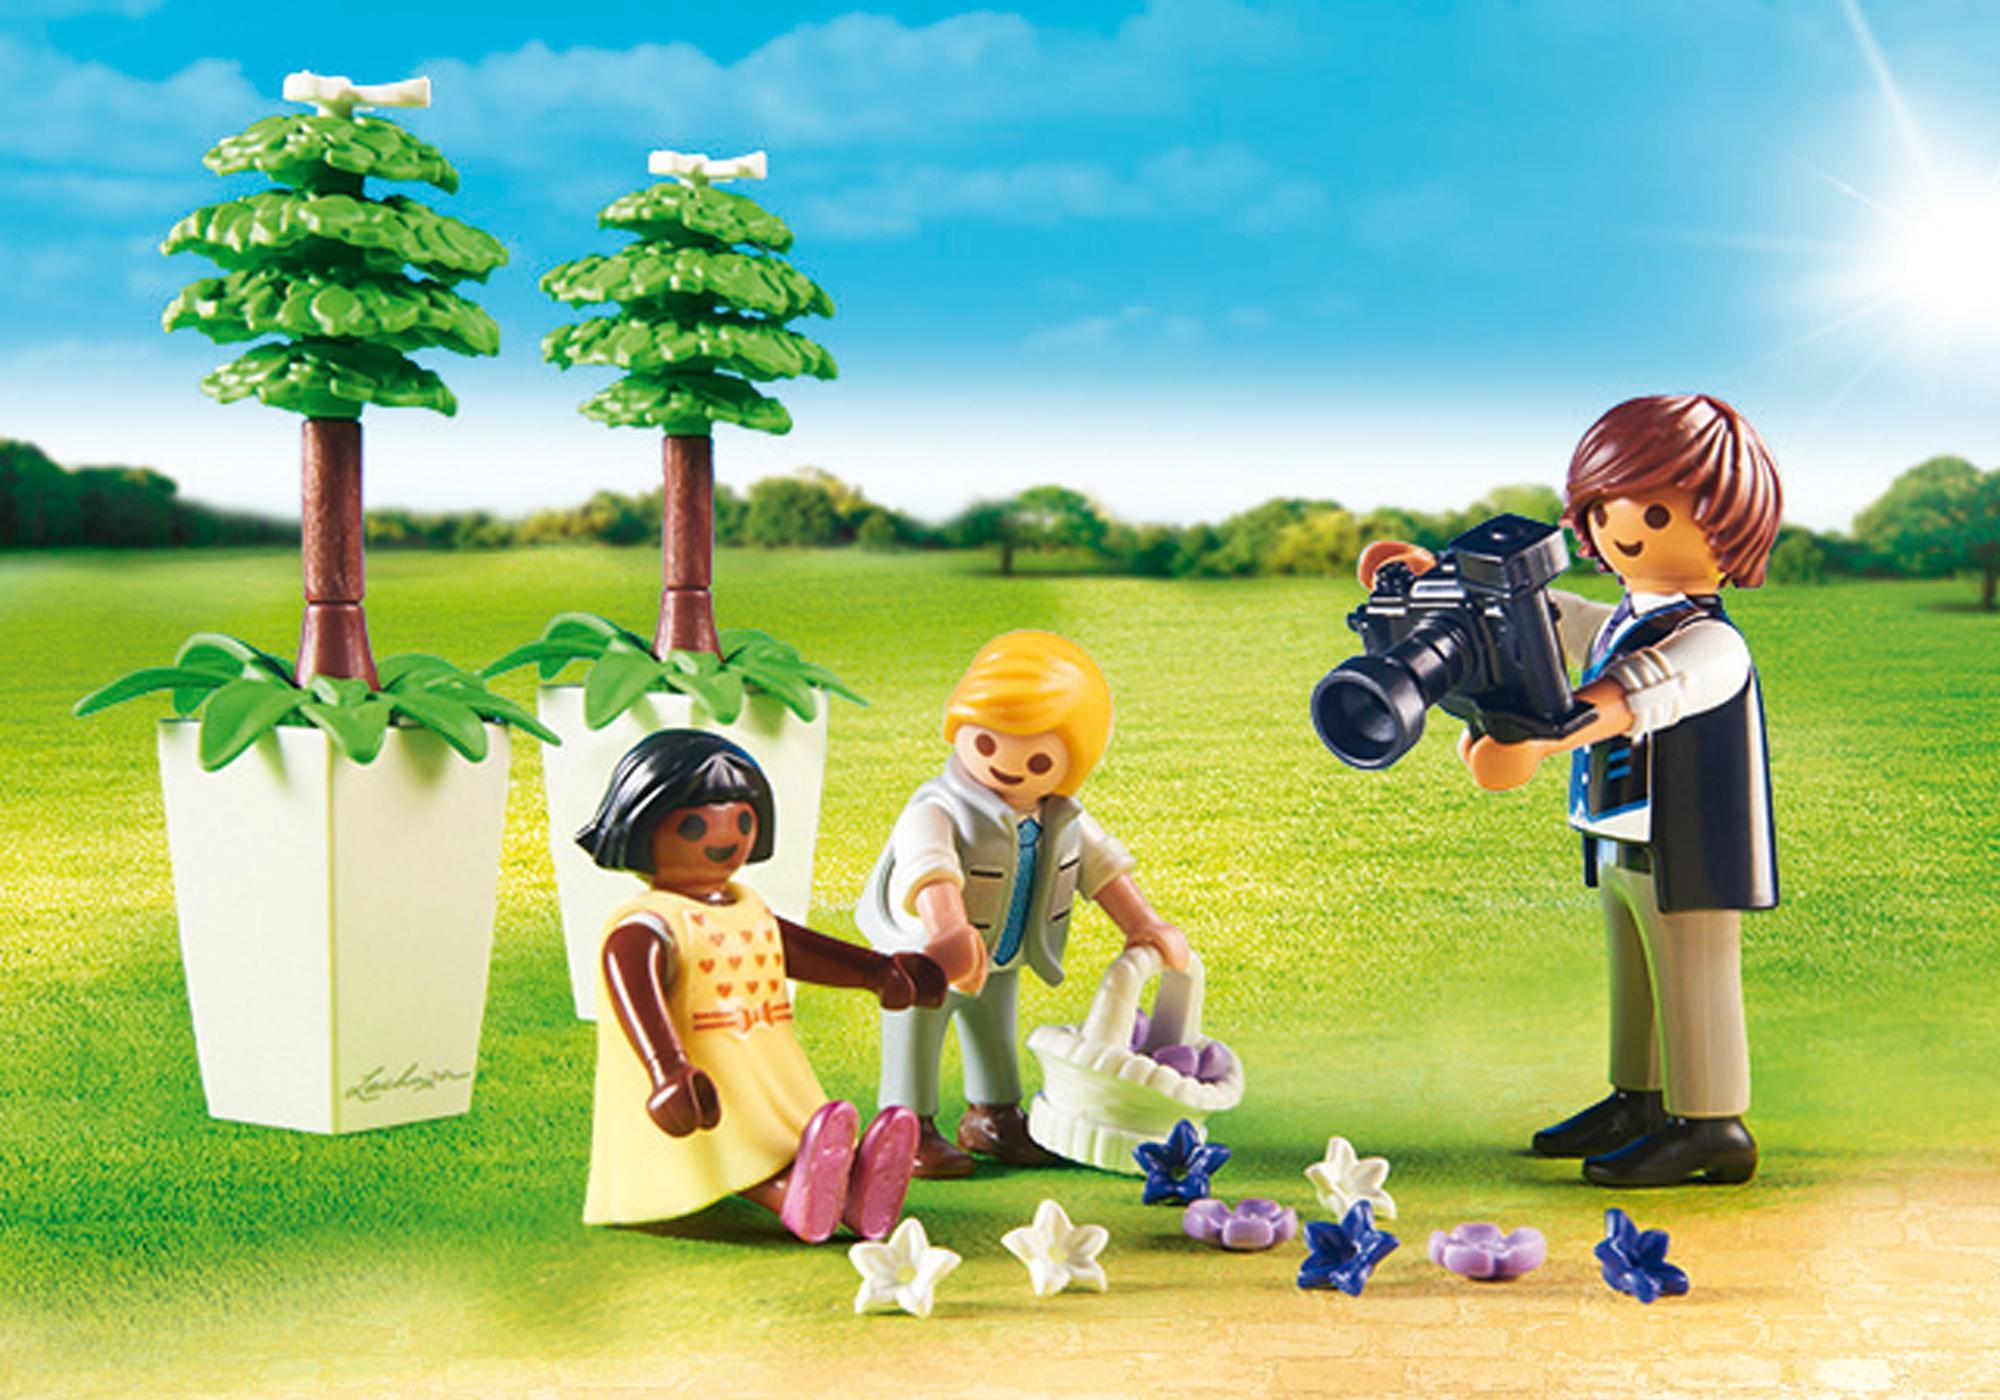 http://media.playmobil.com/i/playmobil/9230_product_extra1/Flower Children and Photographer